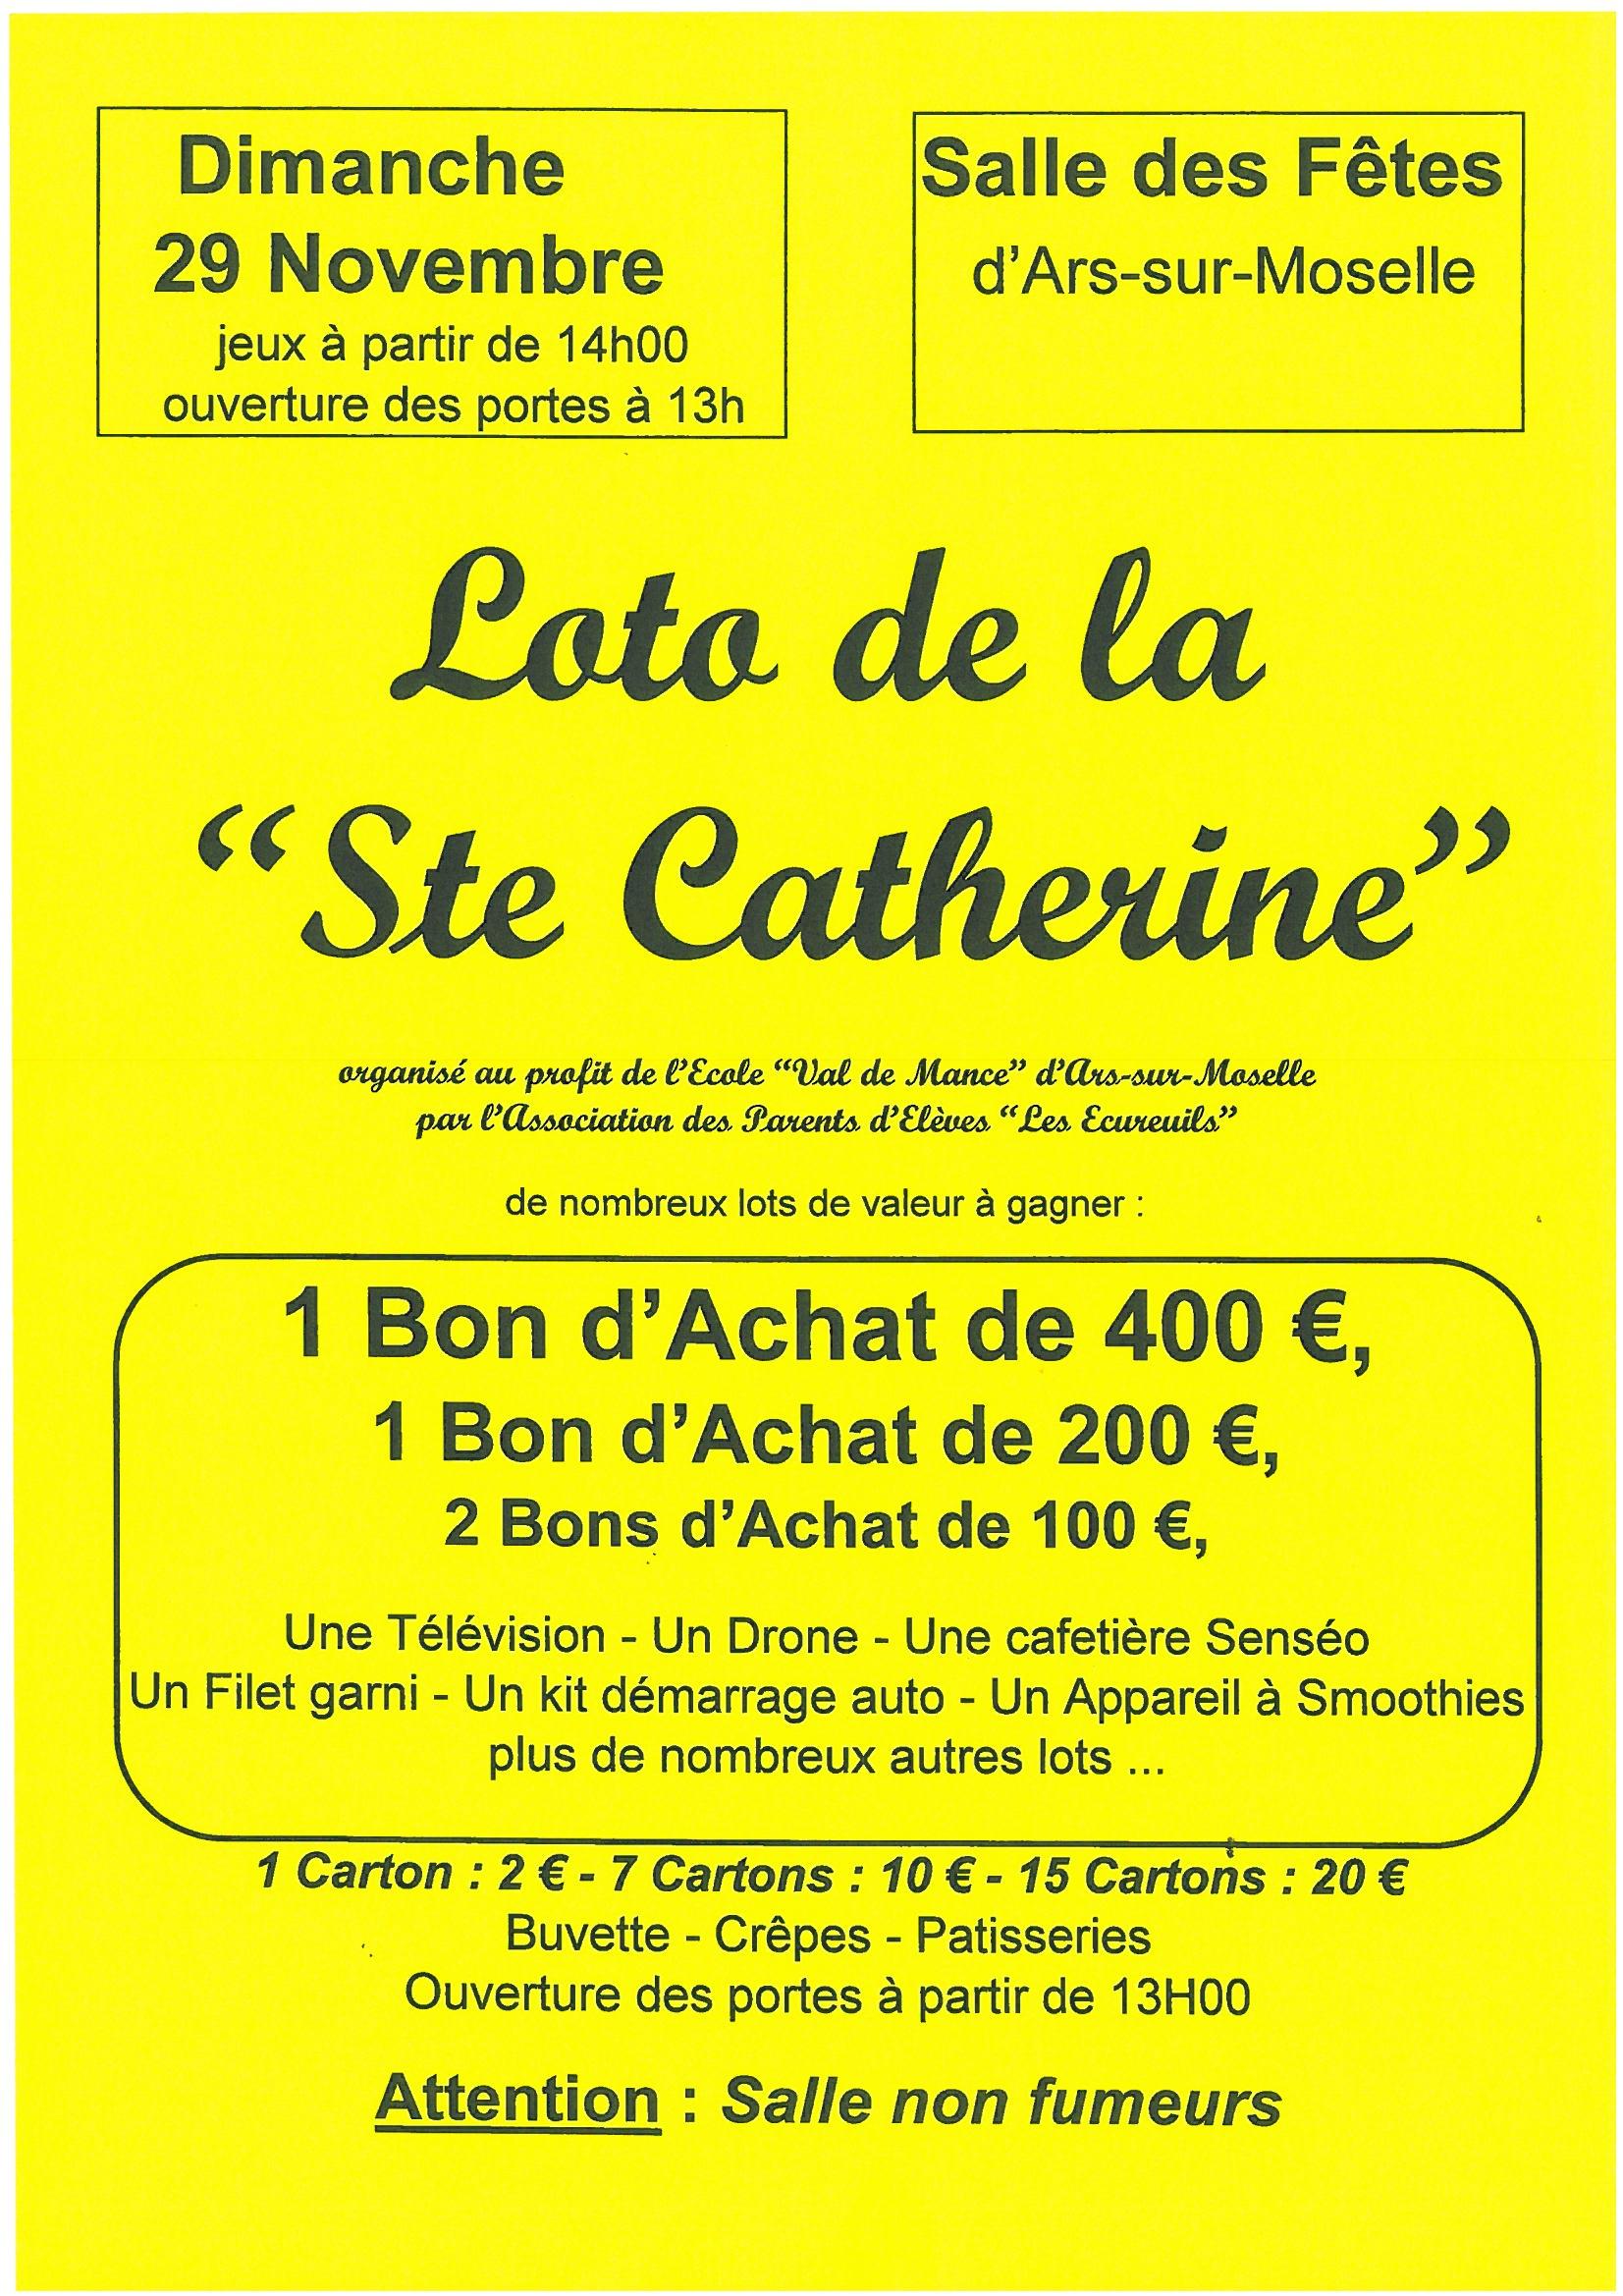 LOTO DE LA SAINTE CATHERINE dimanche 29 novemre